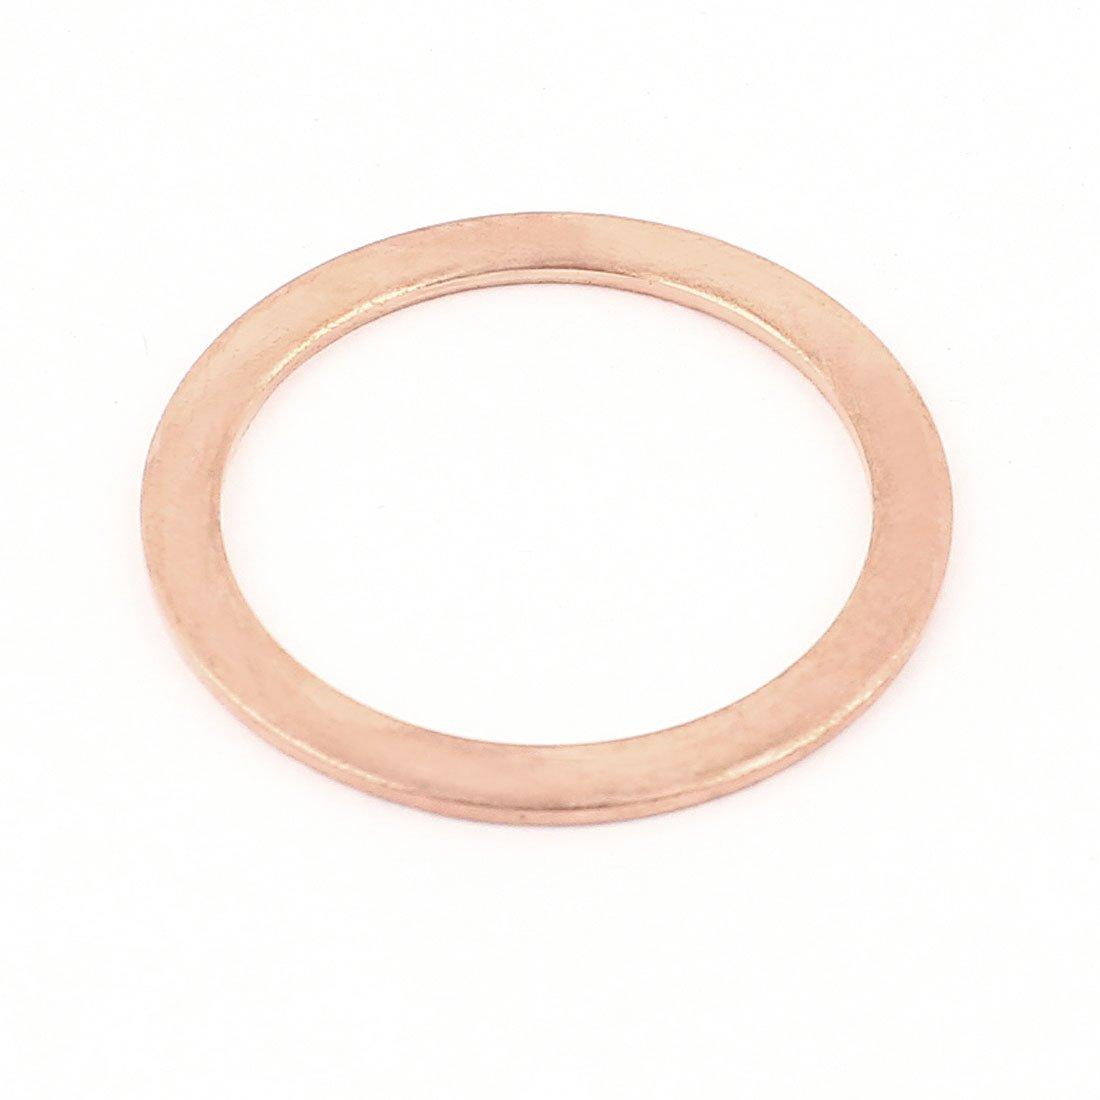 sourcingmap® 38mmx48mmx2mm Cobre Aplastar arandela plana del anillo de sello junta de repuesto a14122500ux0590